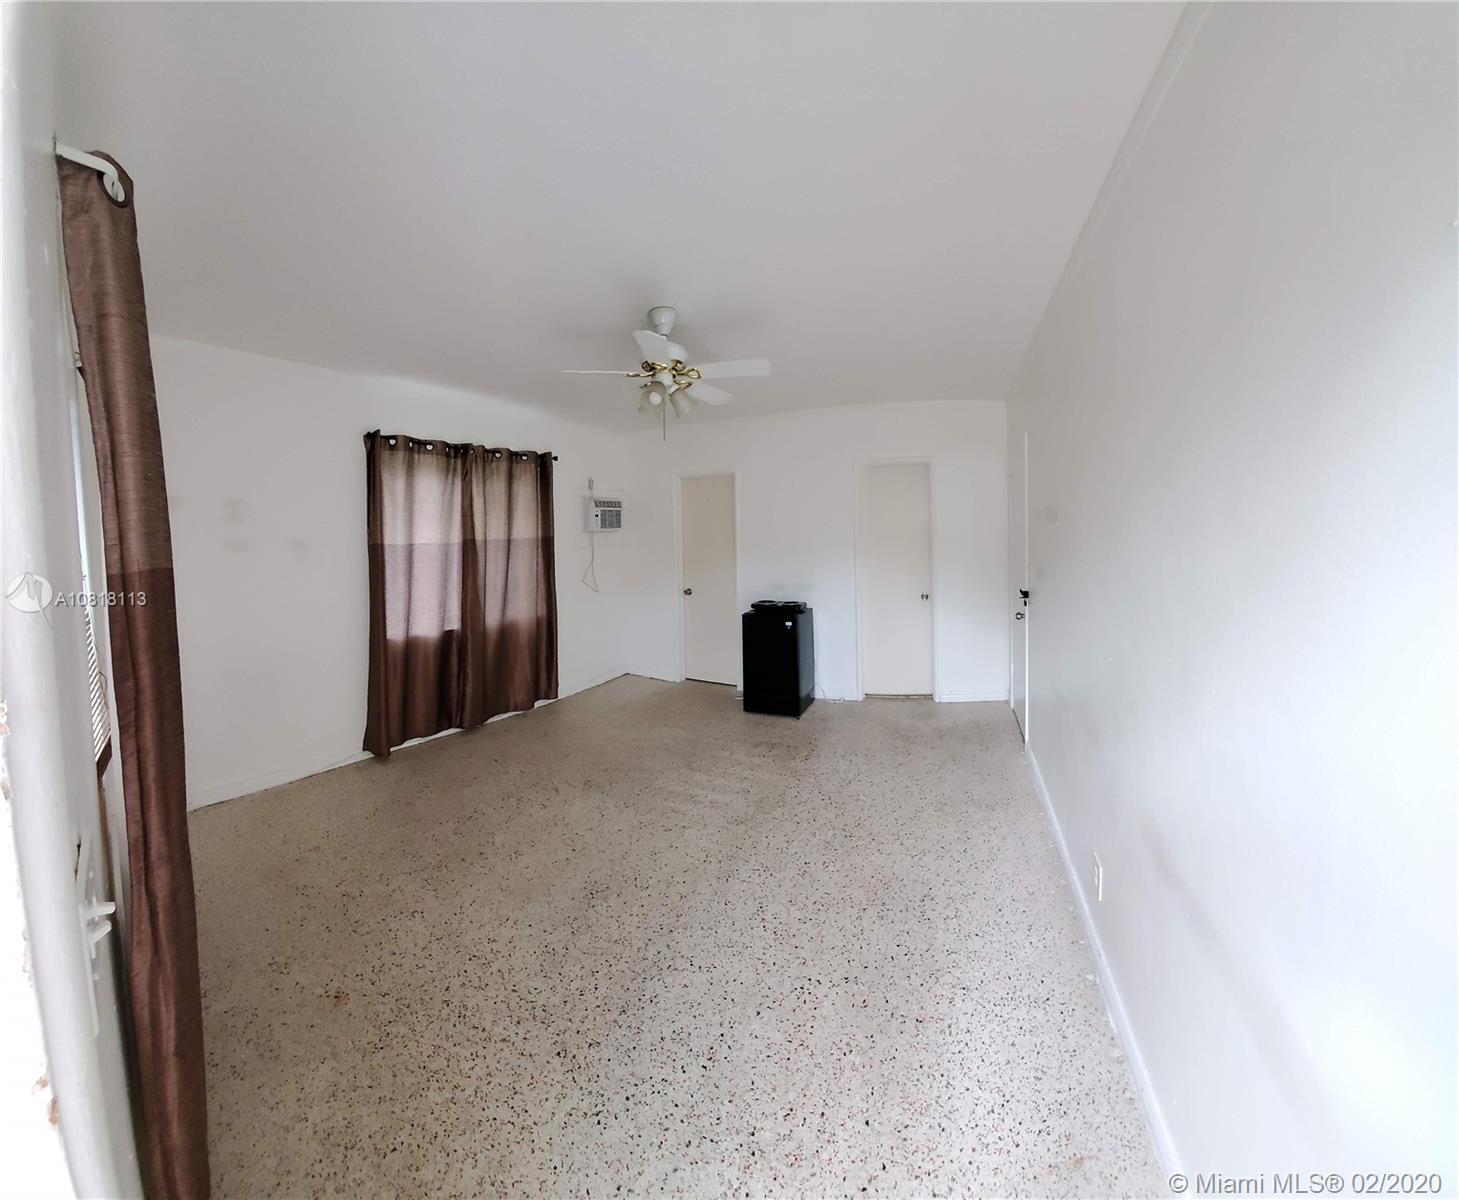 2032  Monroe St #2 For Sale A10818113, FL